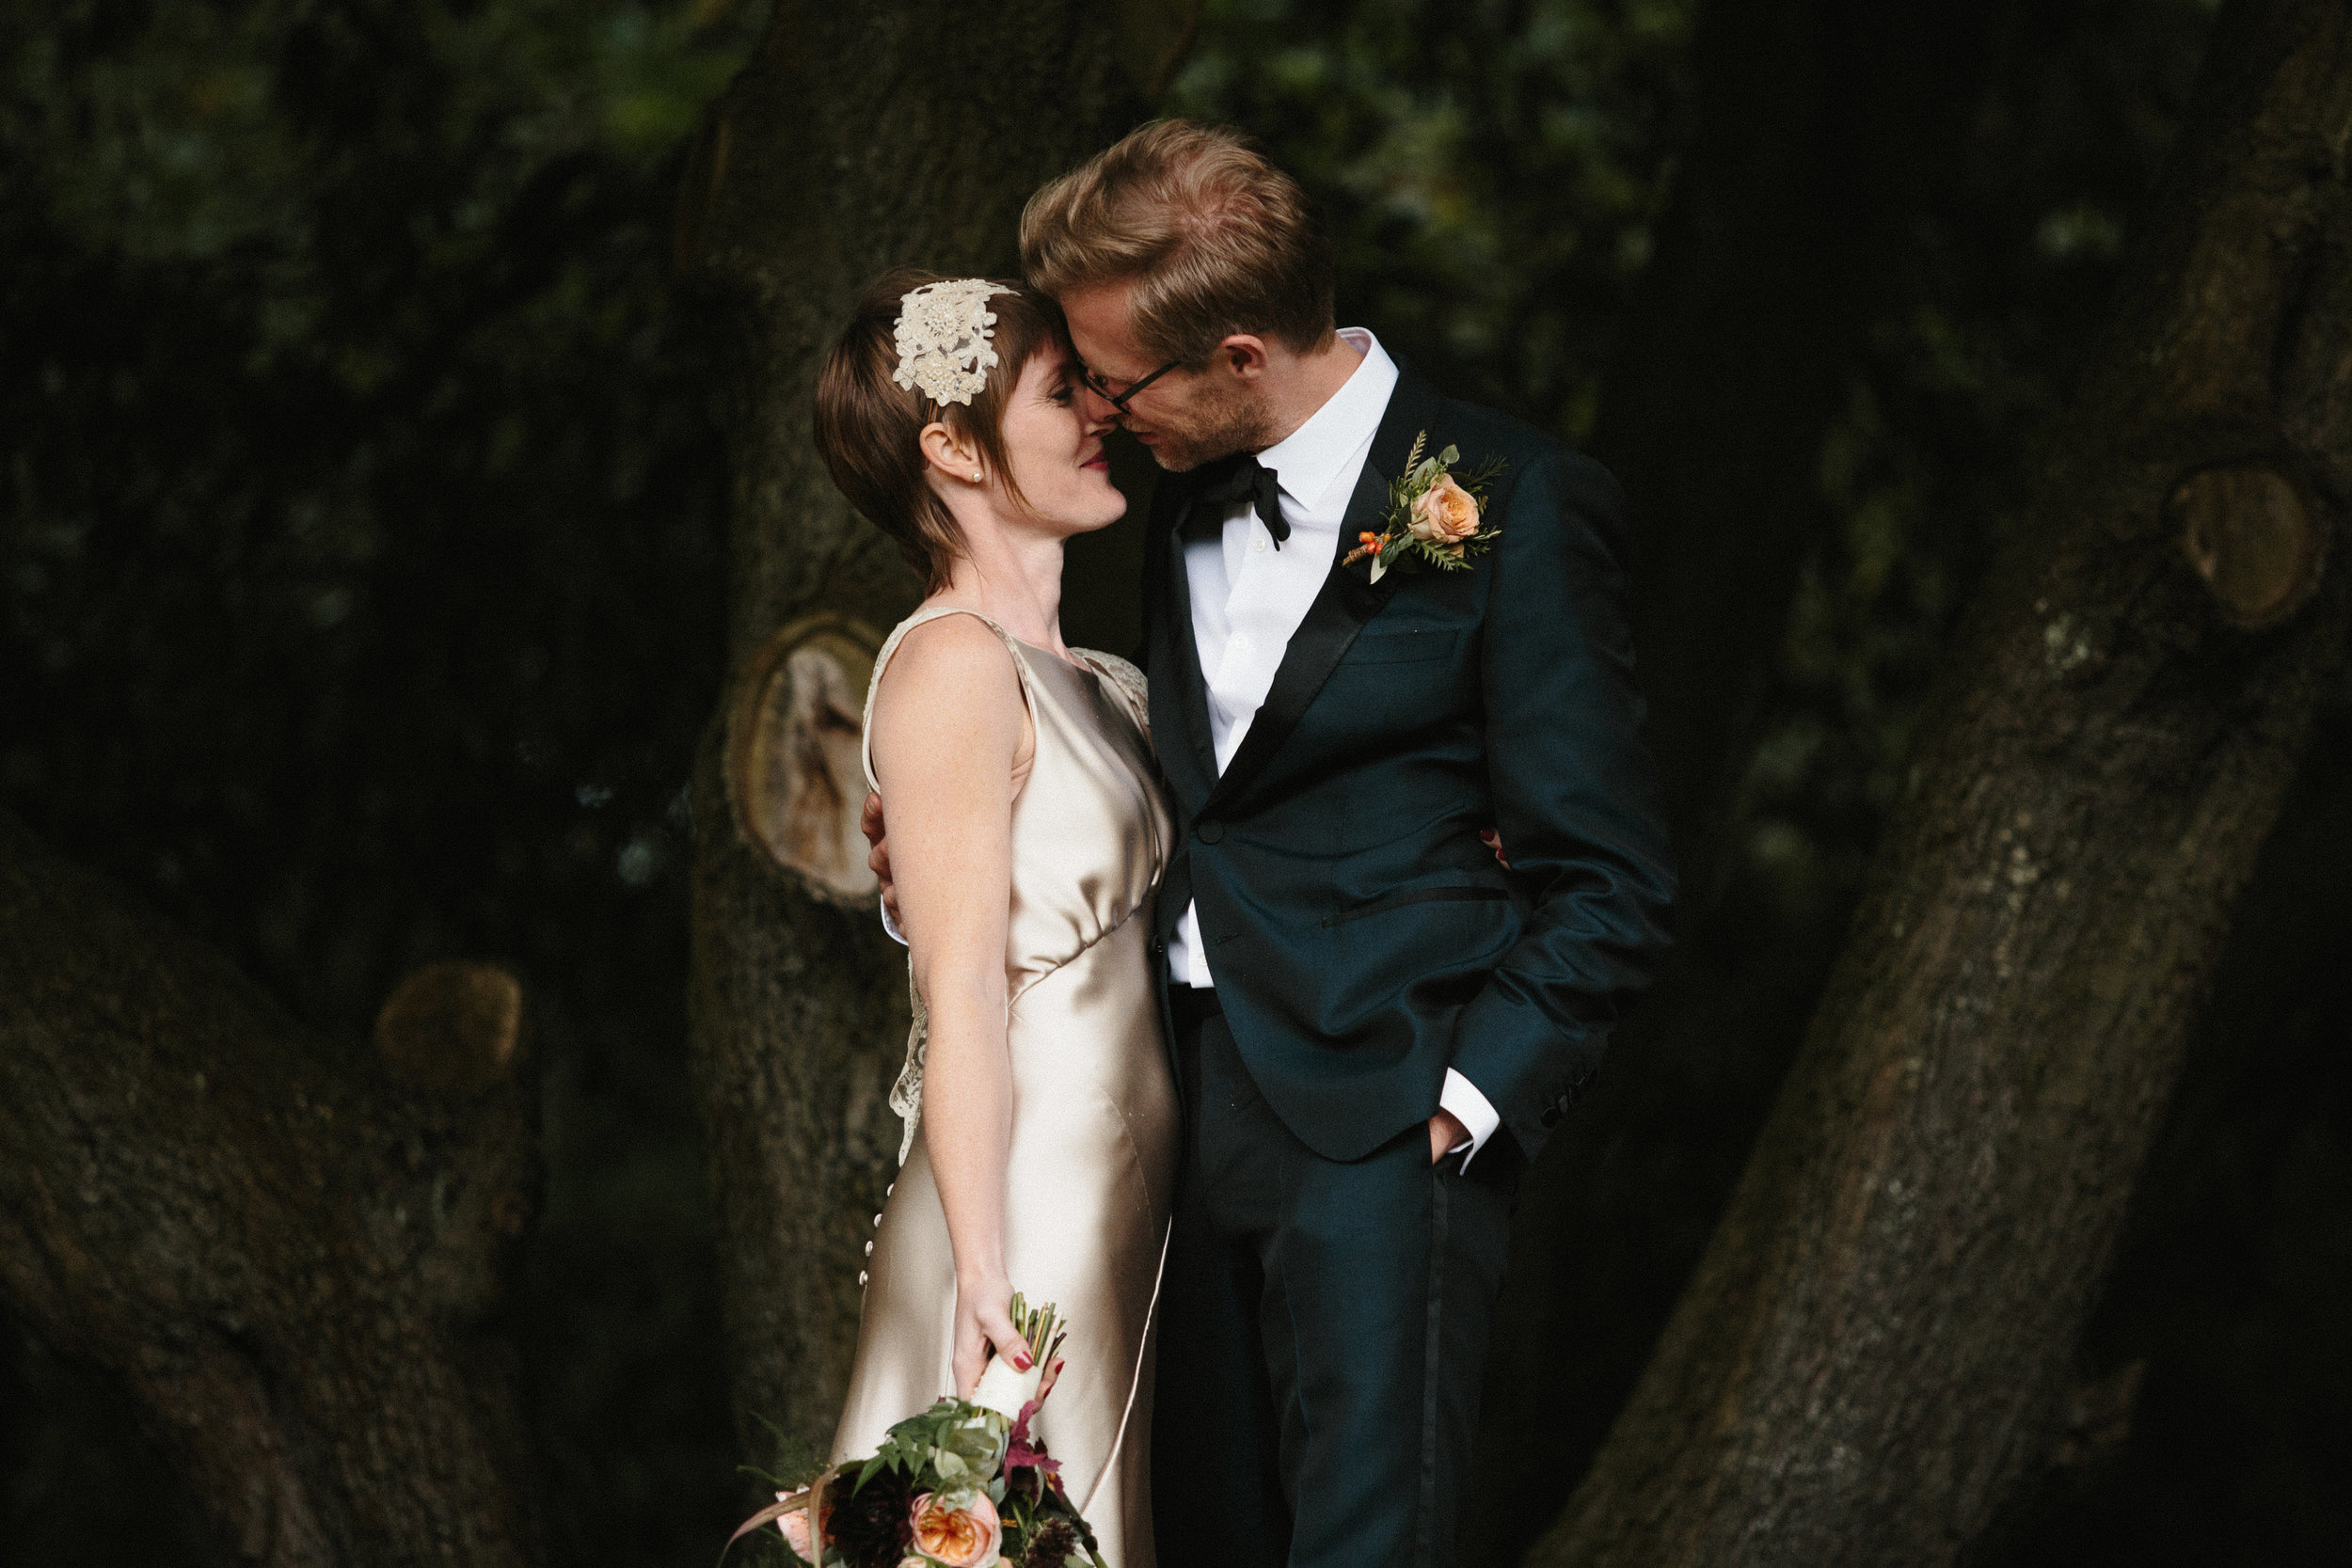 Kate-Beaumont-Sheffield-Honeysuckle-bias-cut-wedding-dress-oyster-Rosie29.jpg